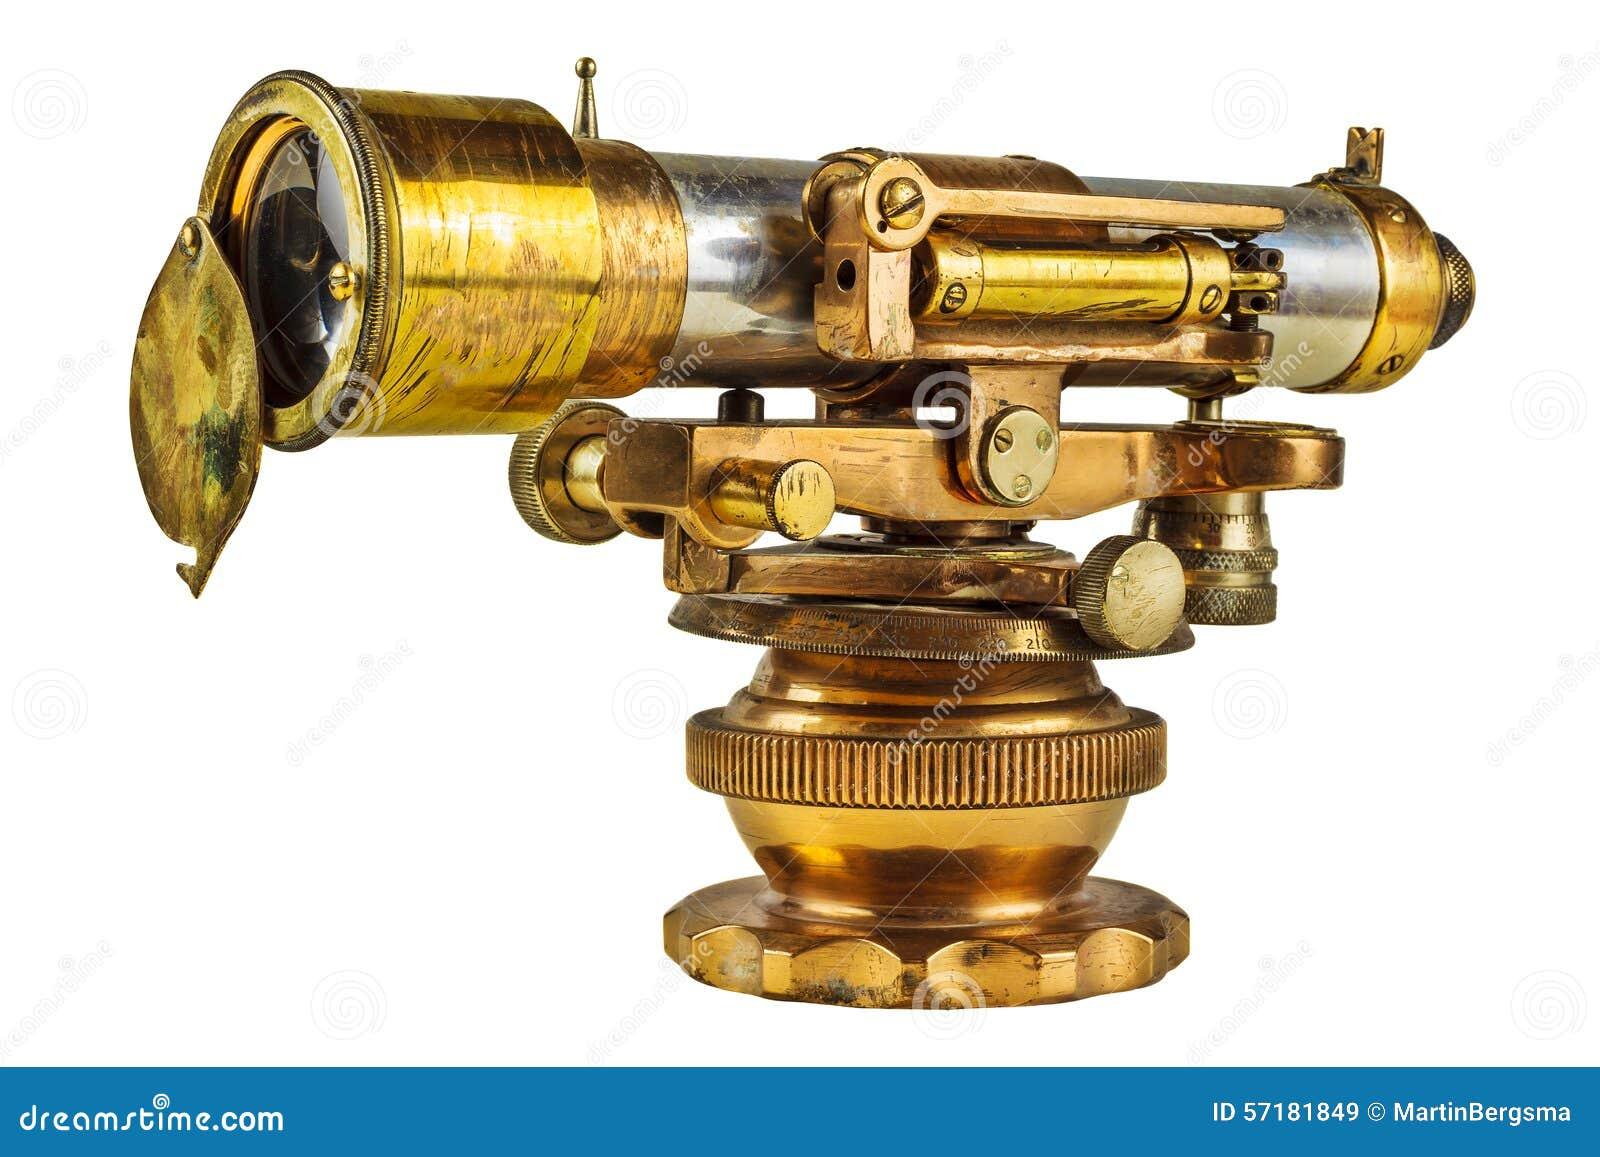 old astronomy equipment - photo #38